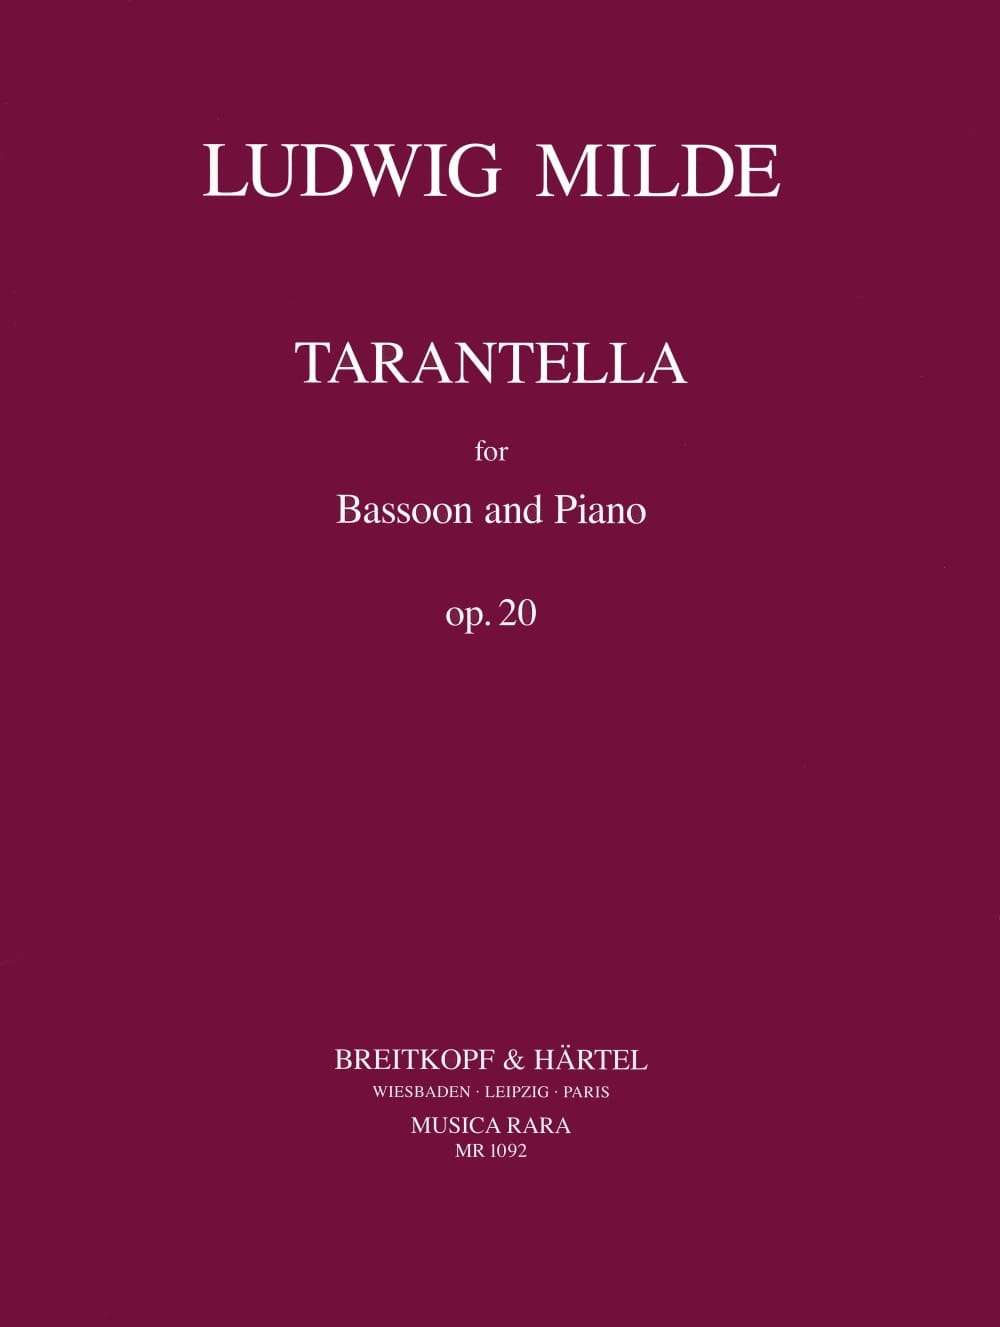 Tarantella op. 20 - Ludwig Milde - Partition - laflutedepan.com